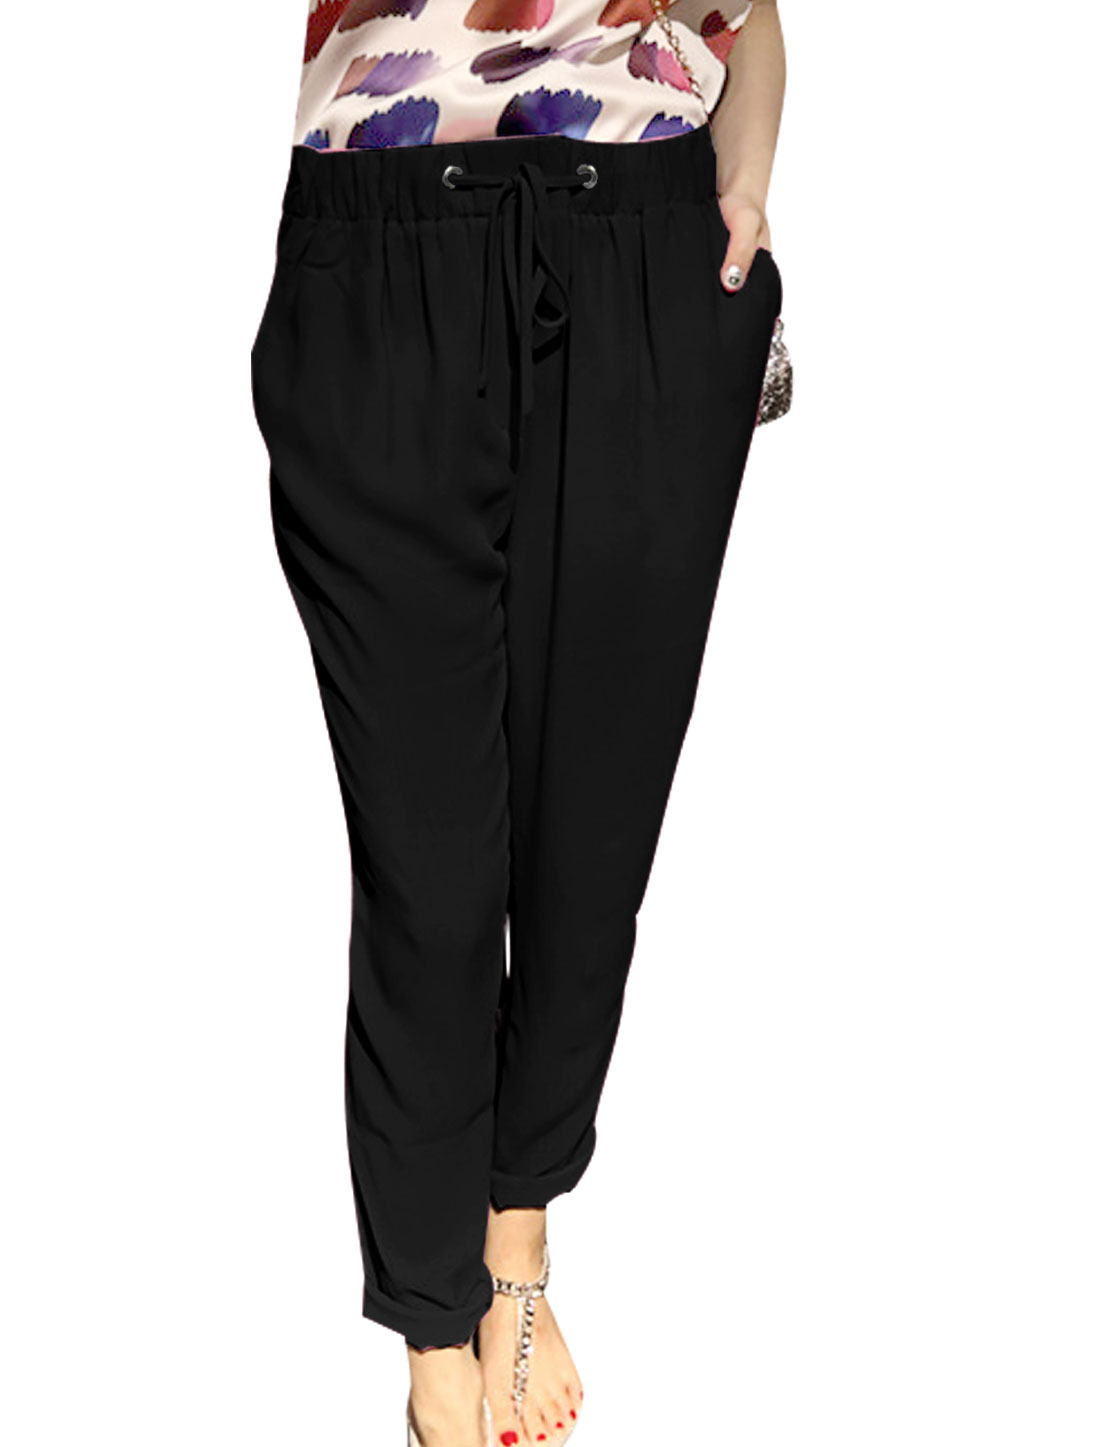 Women Drawstring Waist Double Slant Pockets Leisure Cropped Pants Black XS